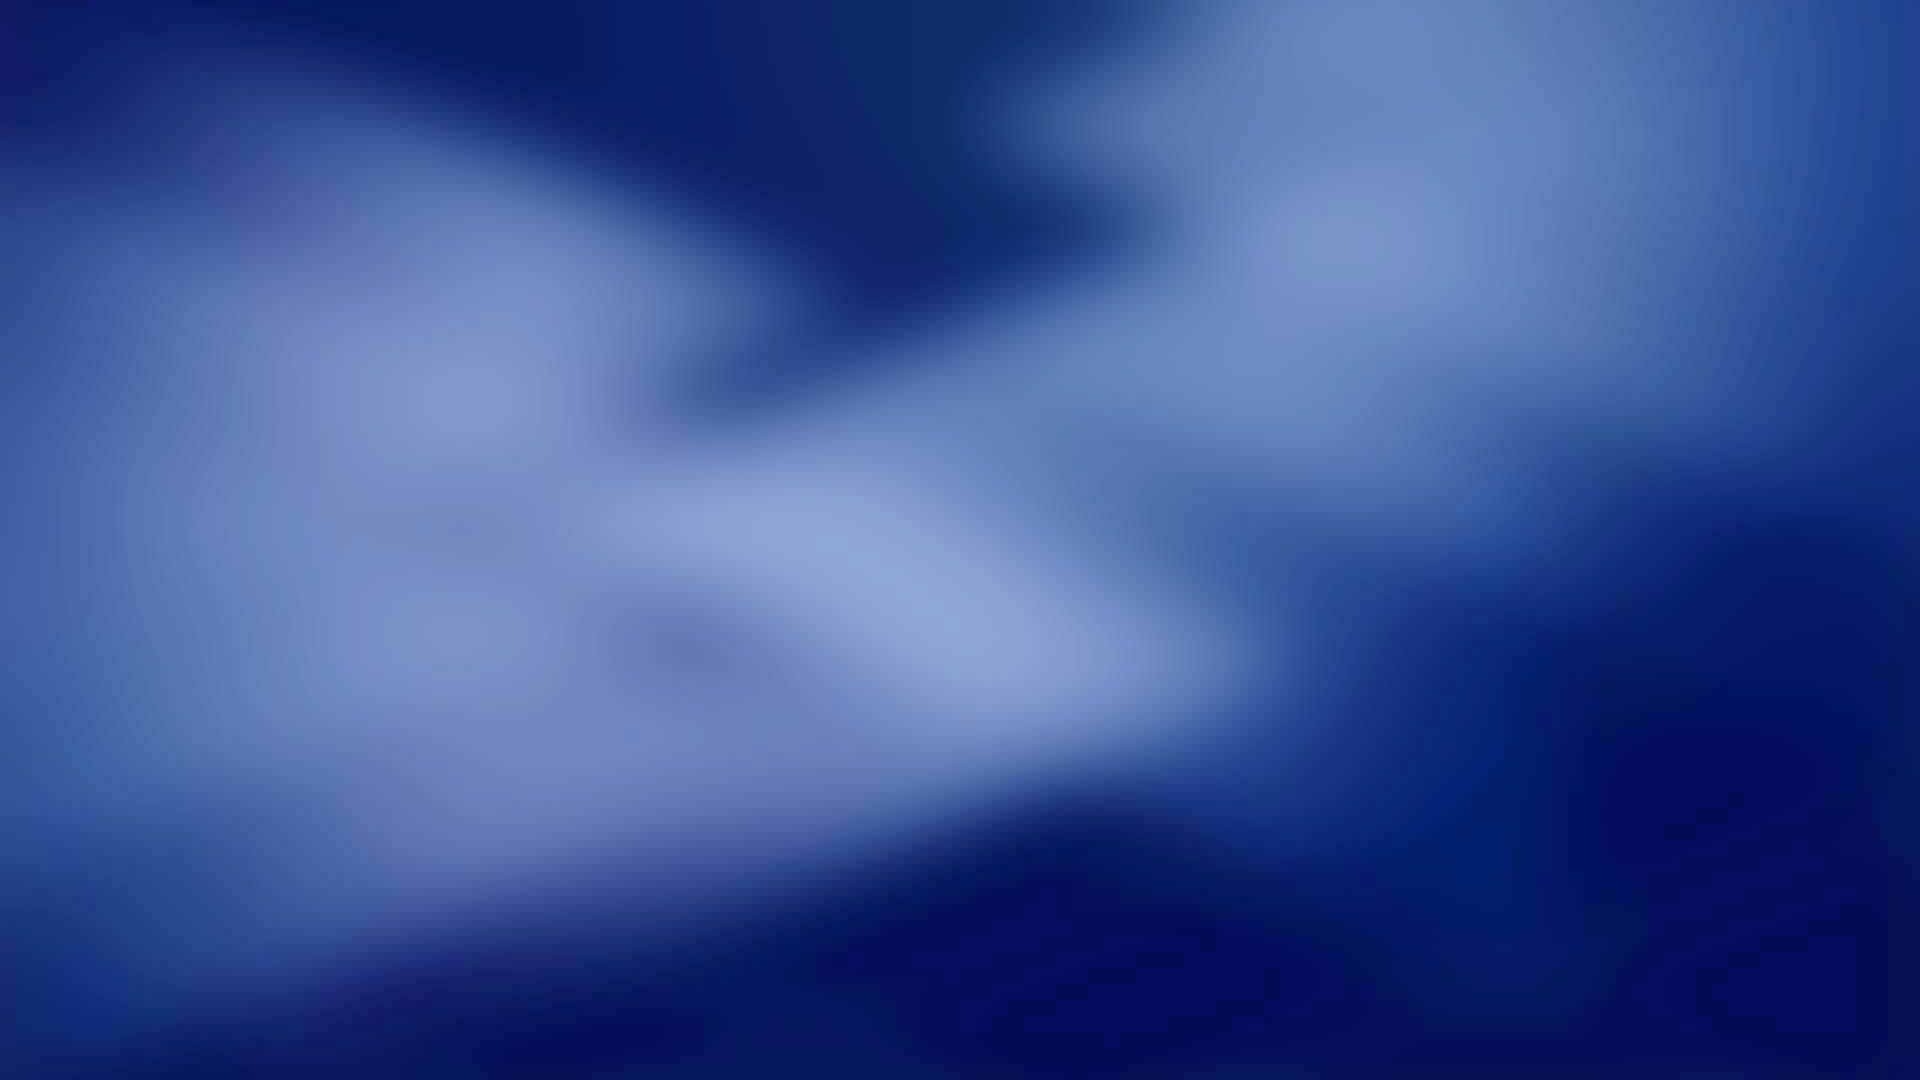 HP multifaber-sfondo-BLU 1